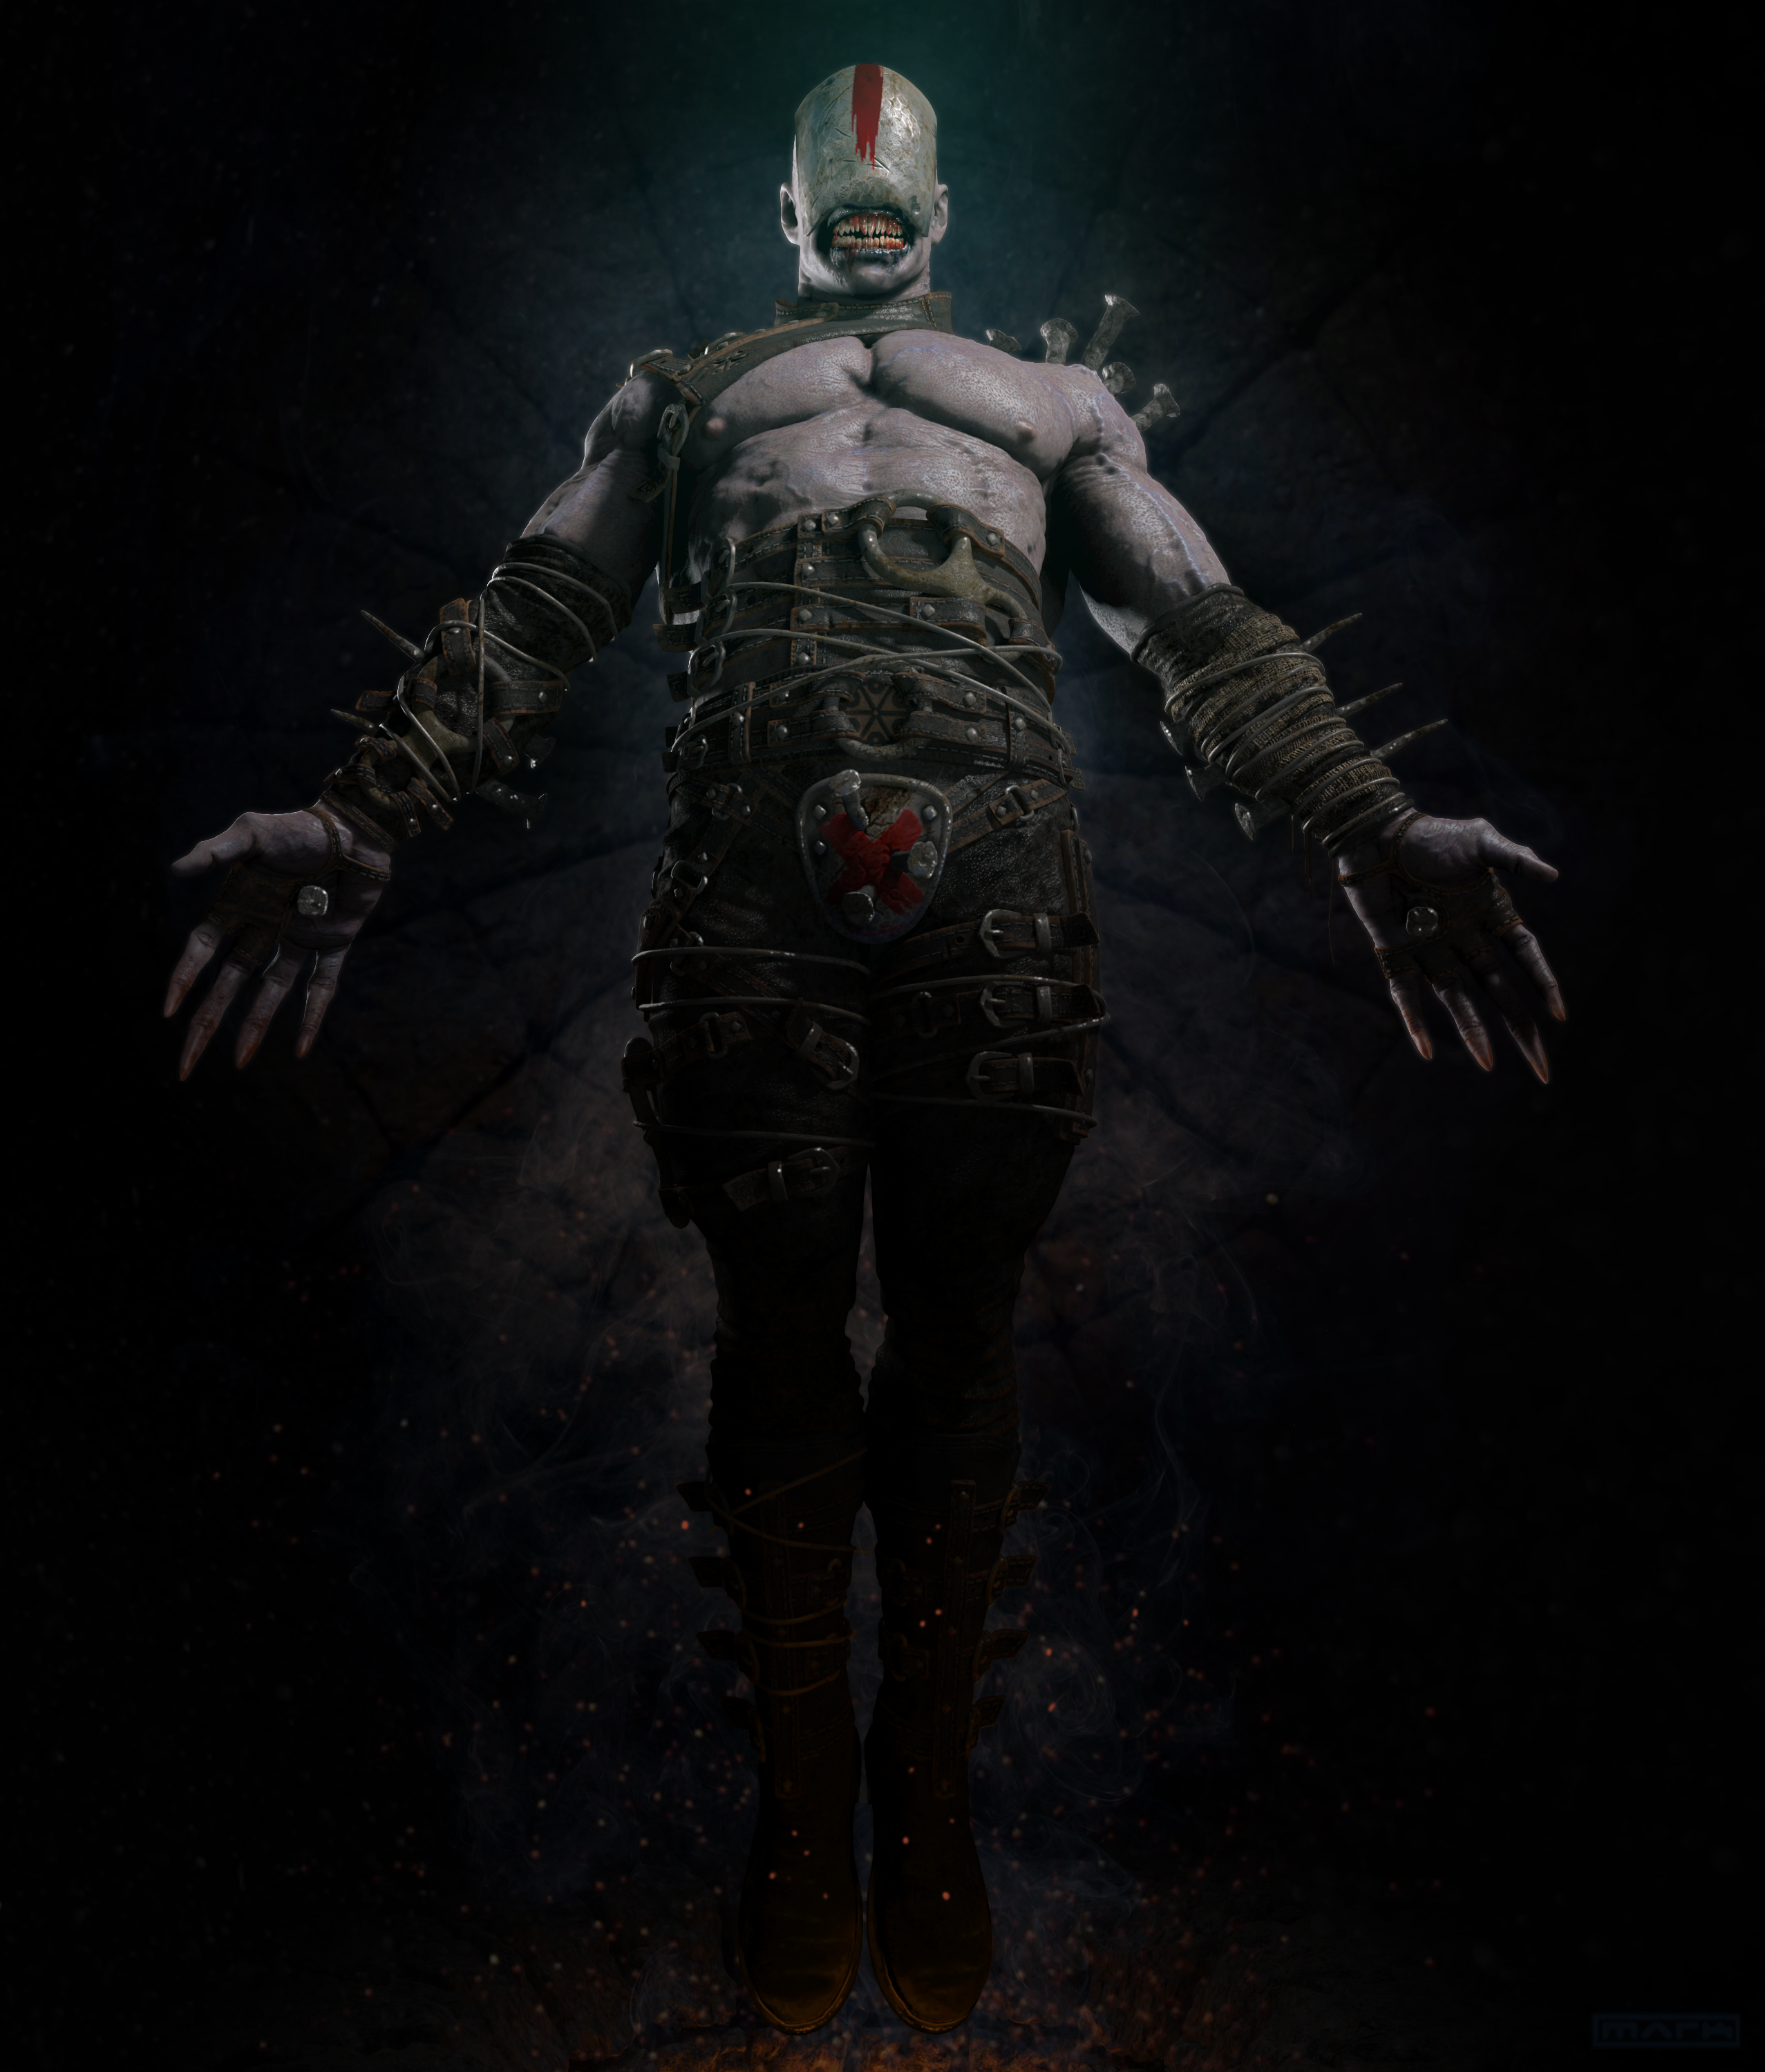 2015-11-10(106417)_Demon.png (2554×2998)